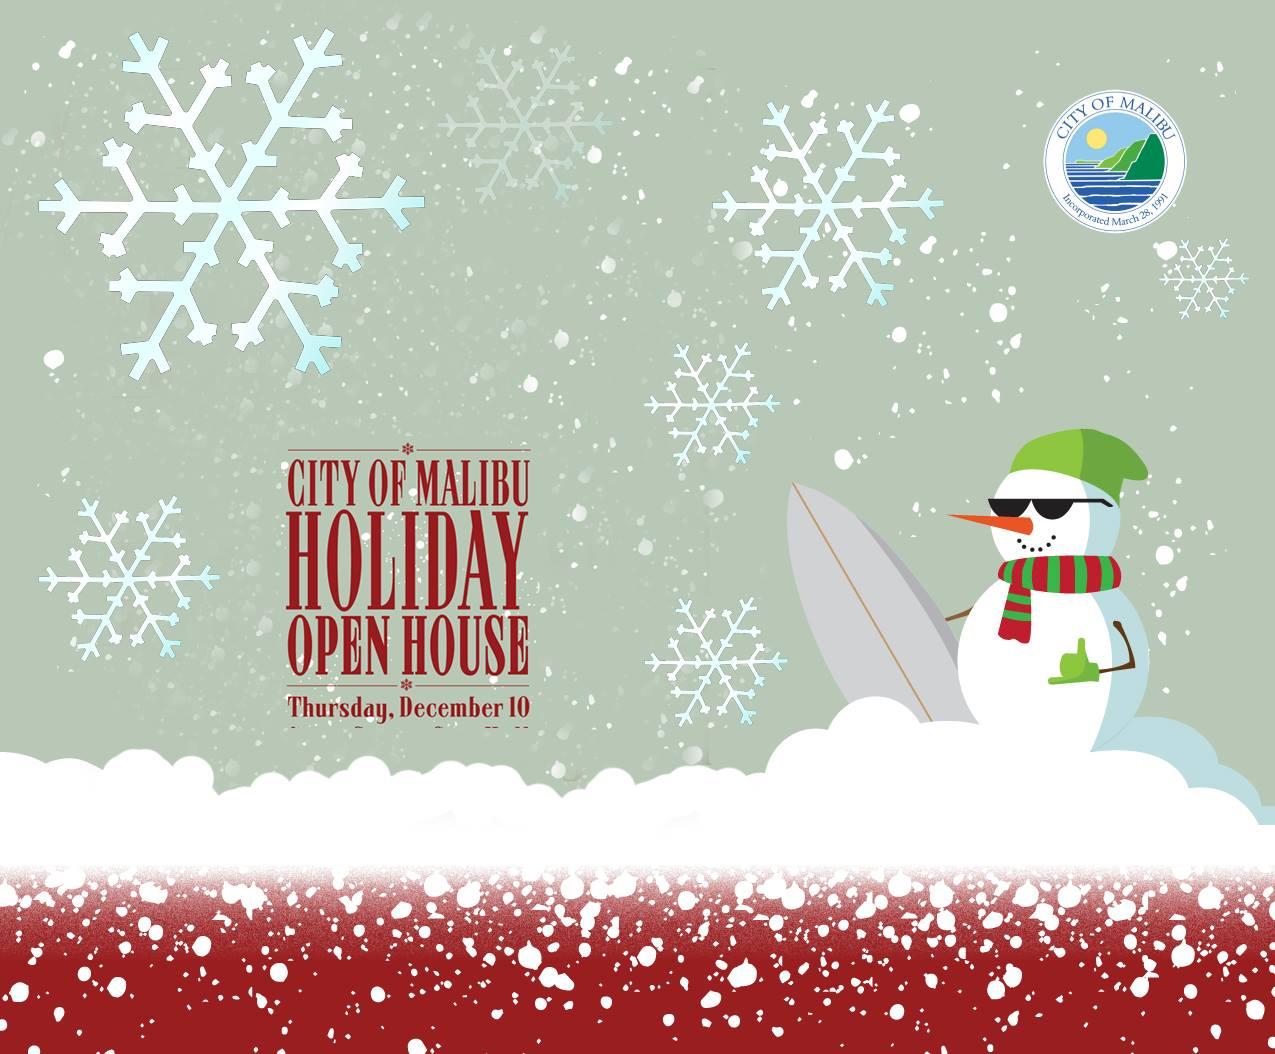 City of Malibu Holiday Open House